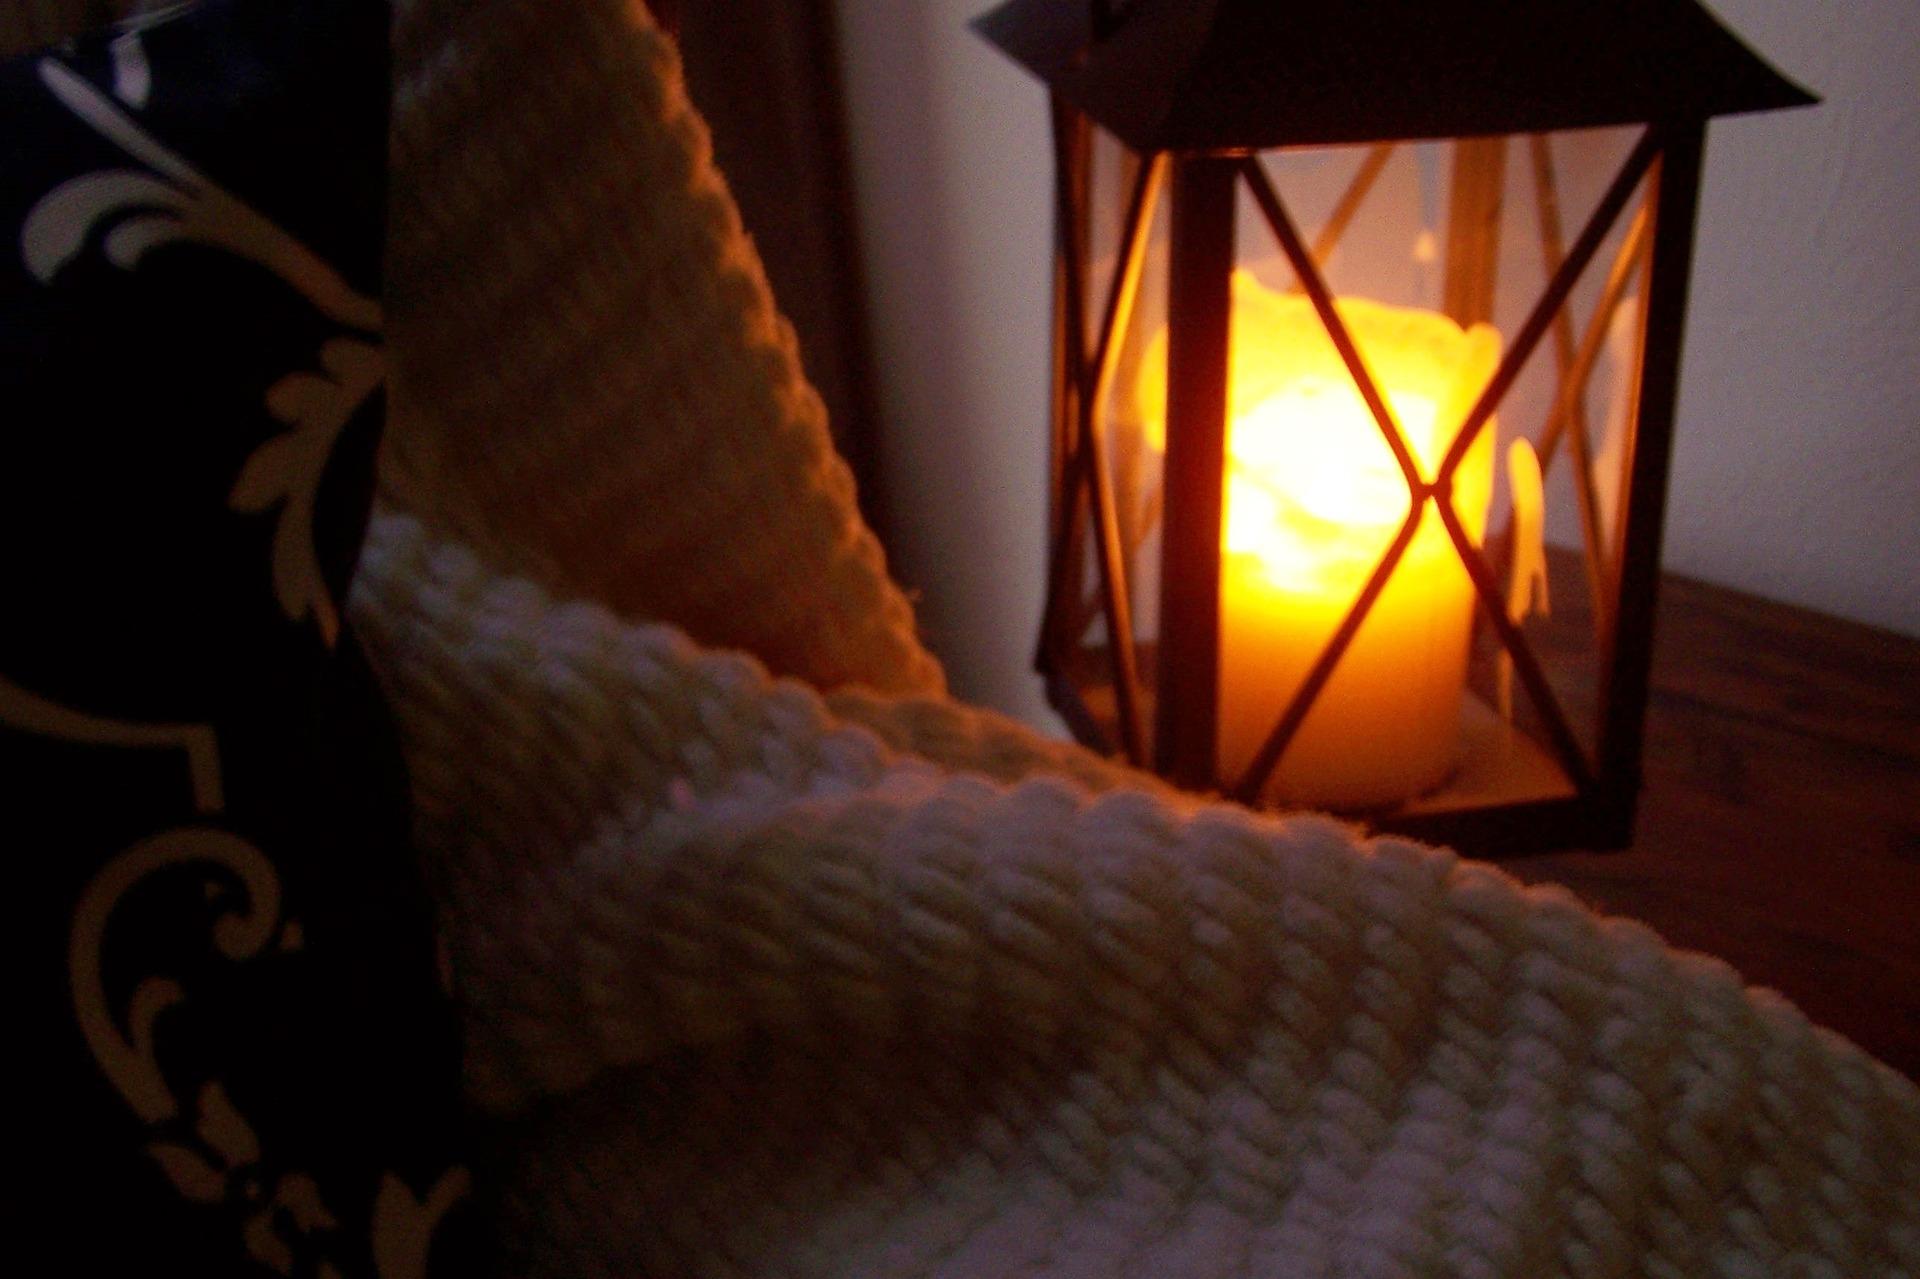 warm lit Lantern https://pixabay.com/photos/lantern-candle-blanket-cozy-827784/